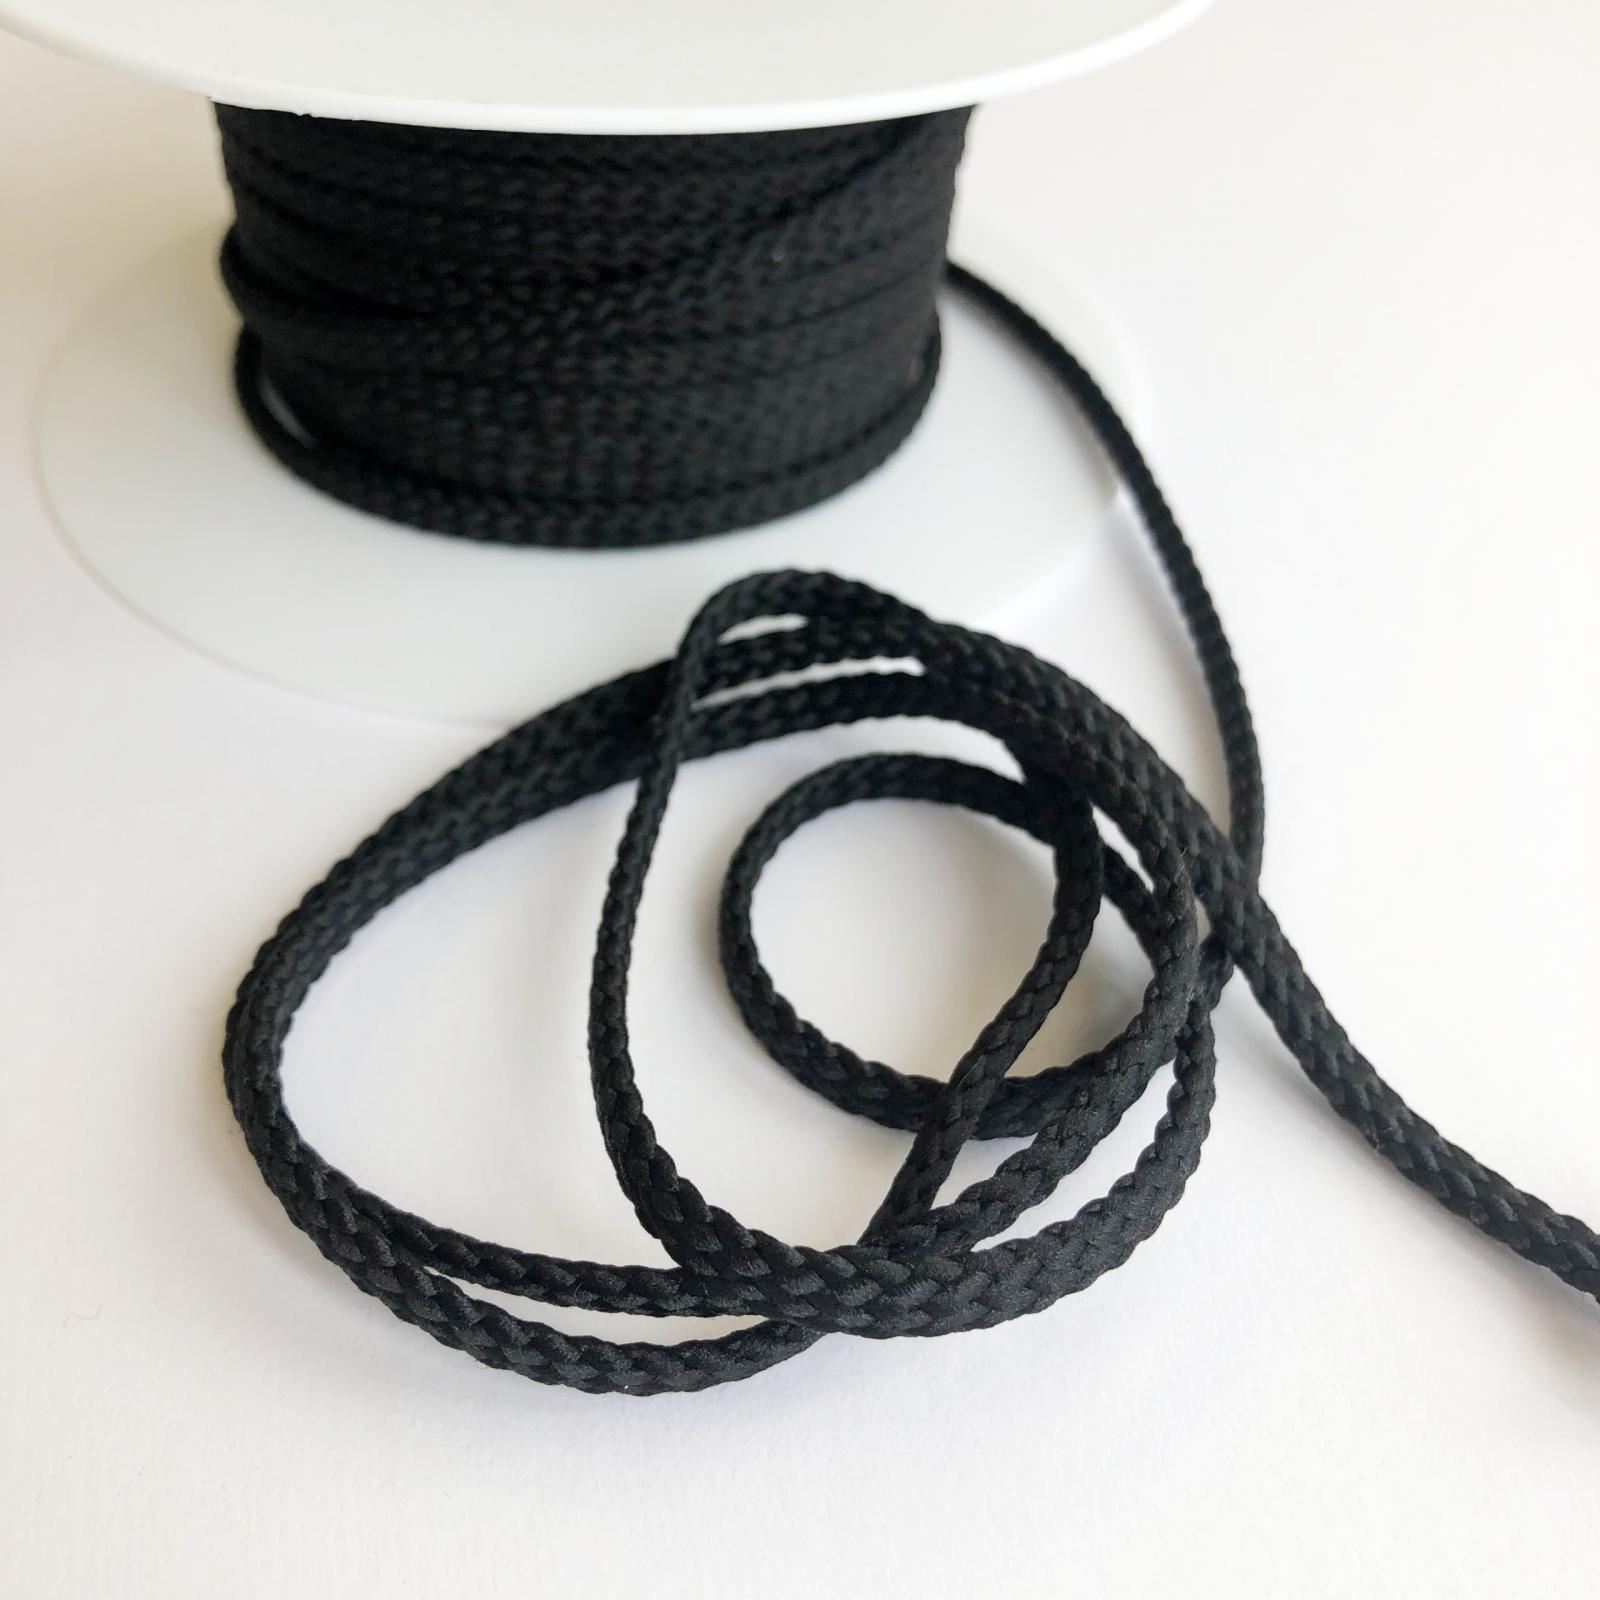 Drawstring Cord - Black